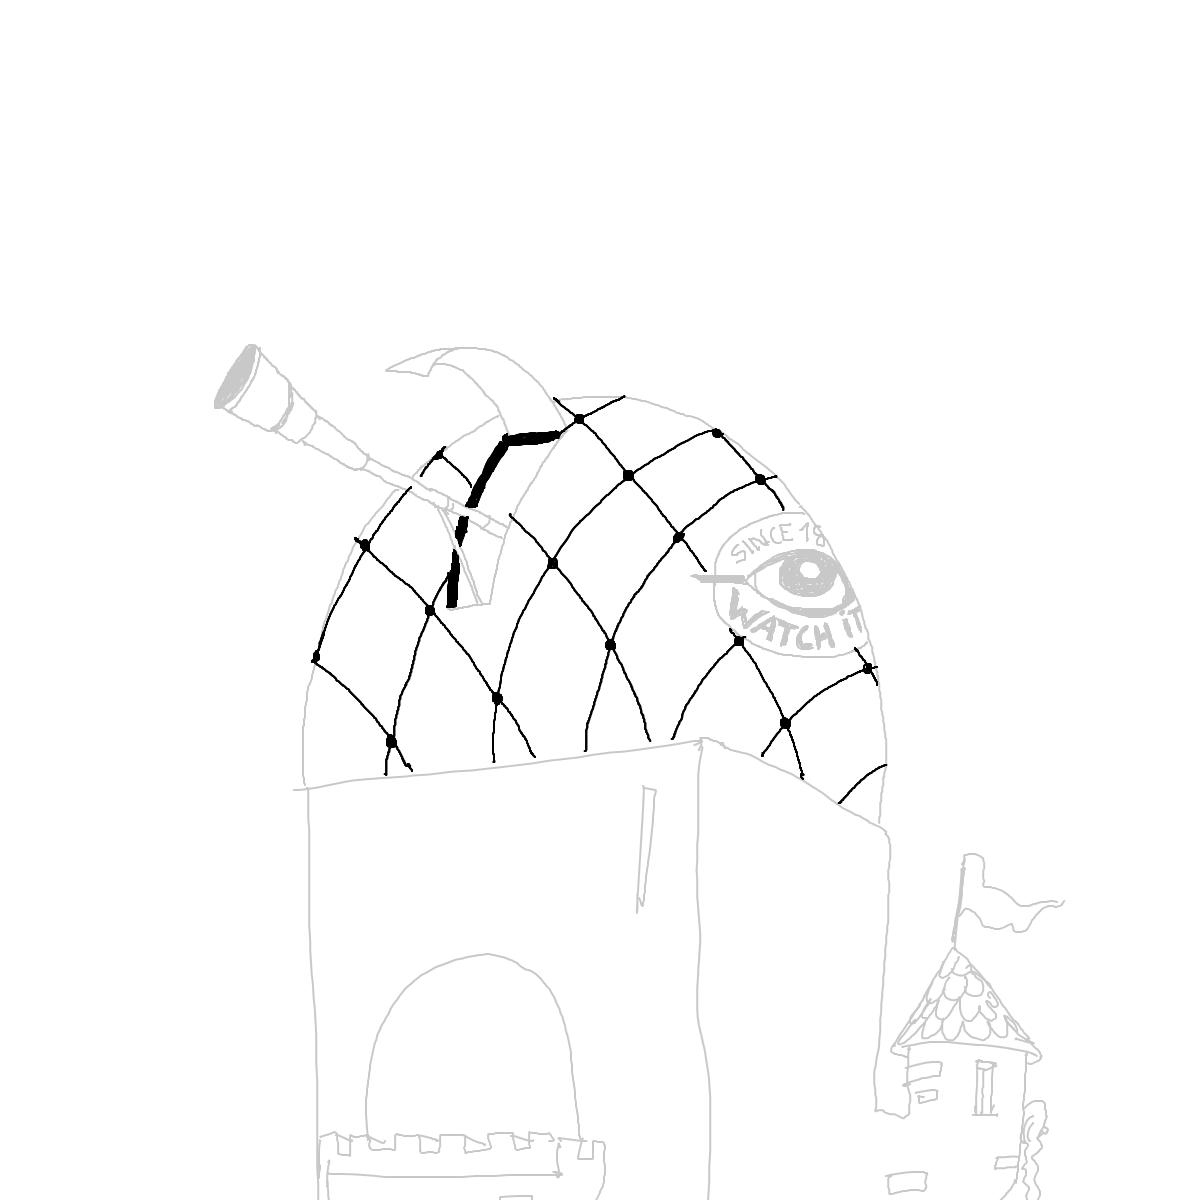 BAAAM drawing#3789 lat:78.4176025390625000lng: -4.4395356178283690